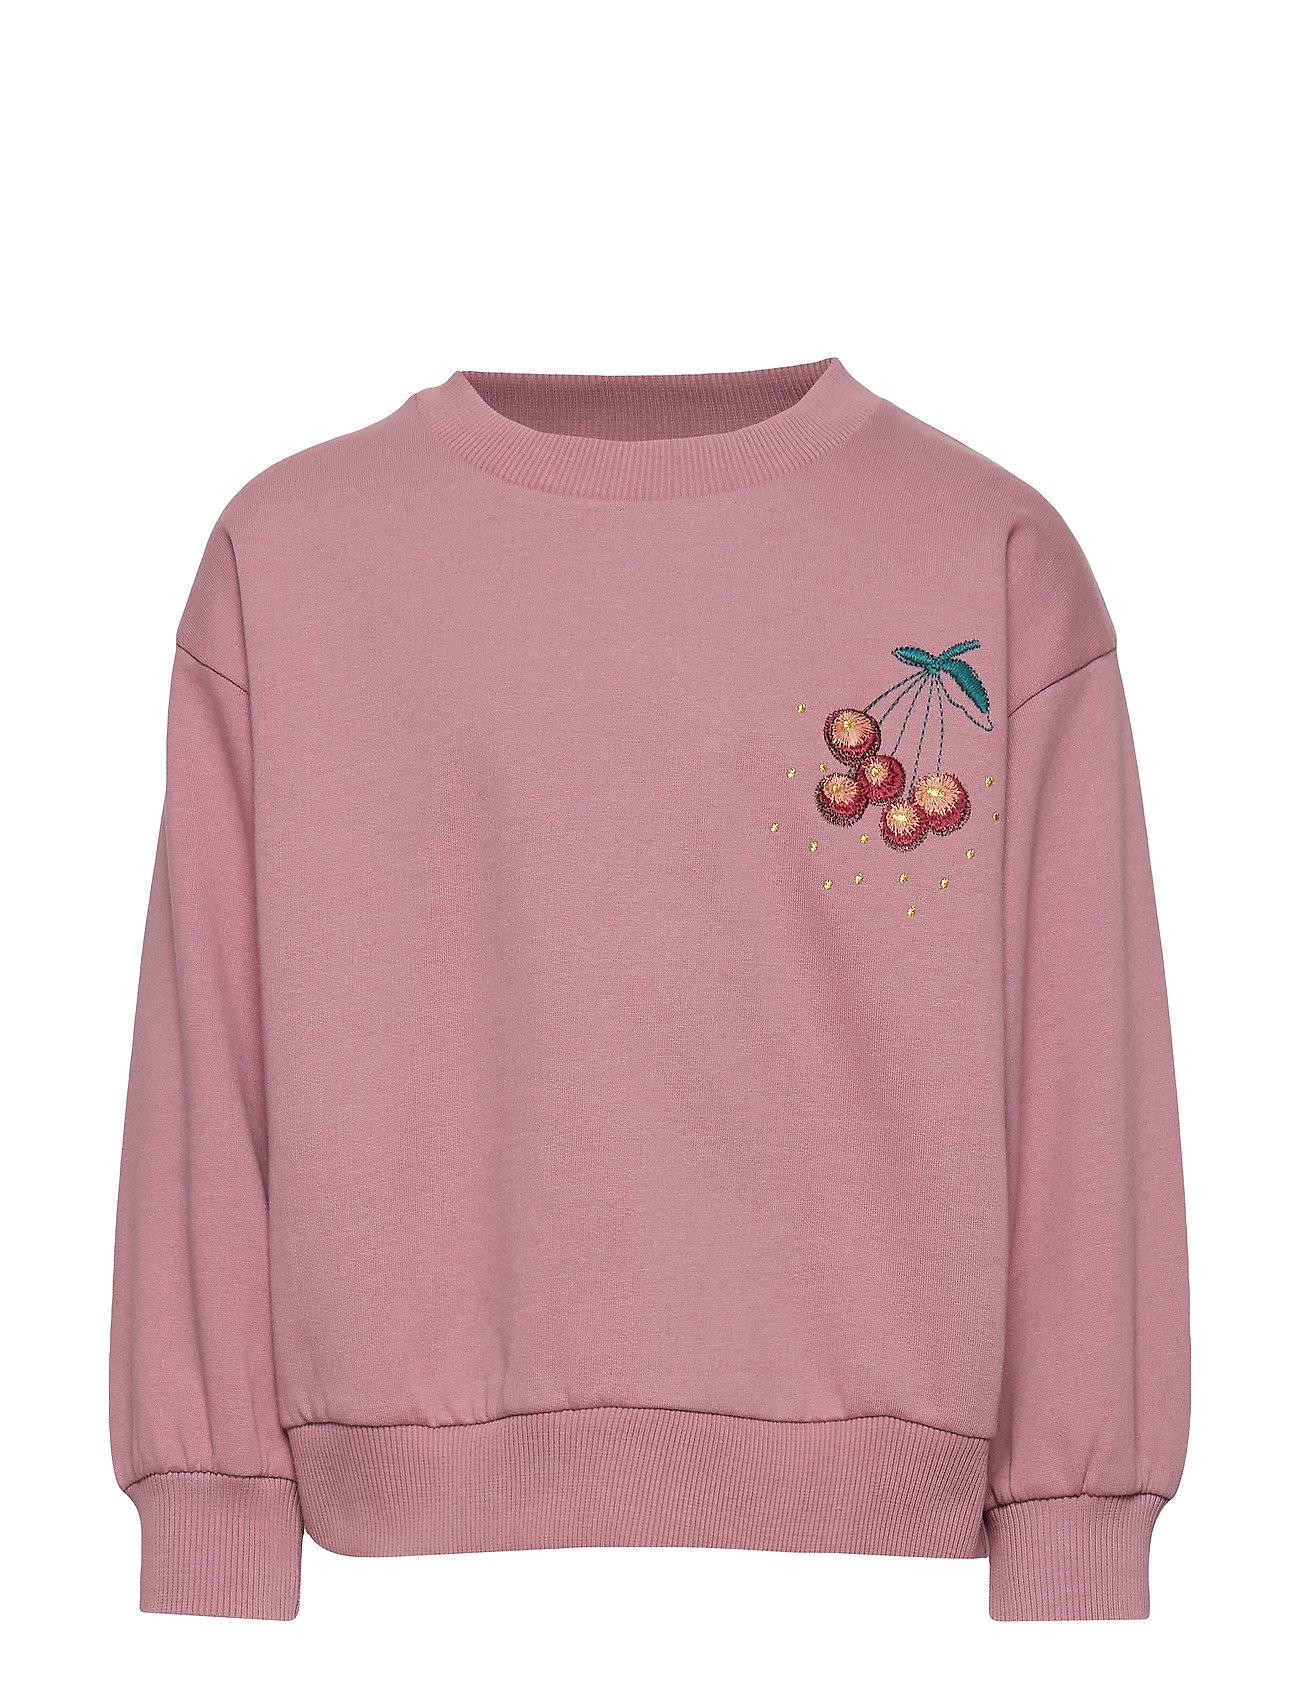 Soft Gallery Drew Sweatshirt - NOSTALGIA ROSE, BERRIES EMB.